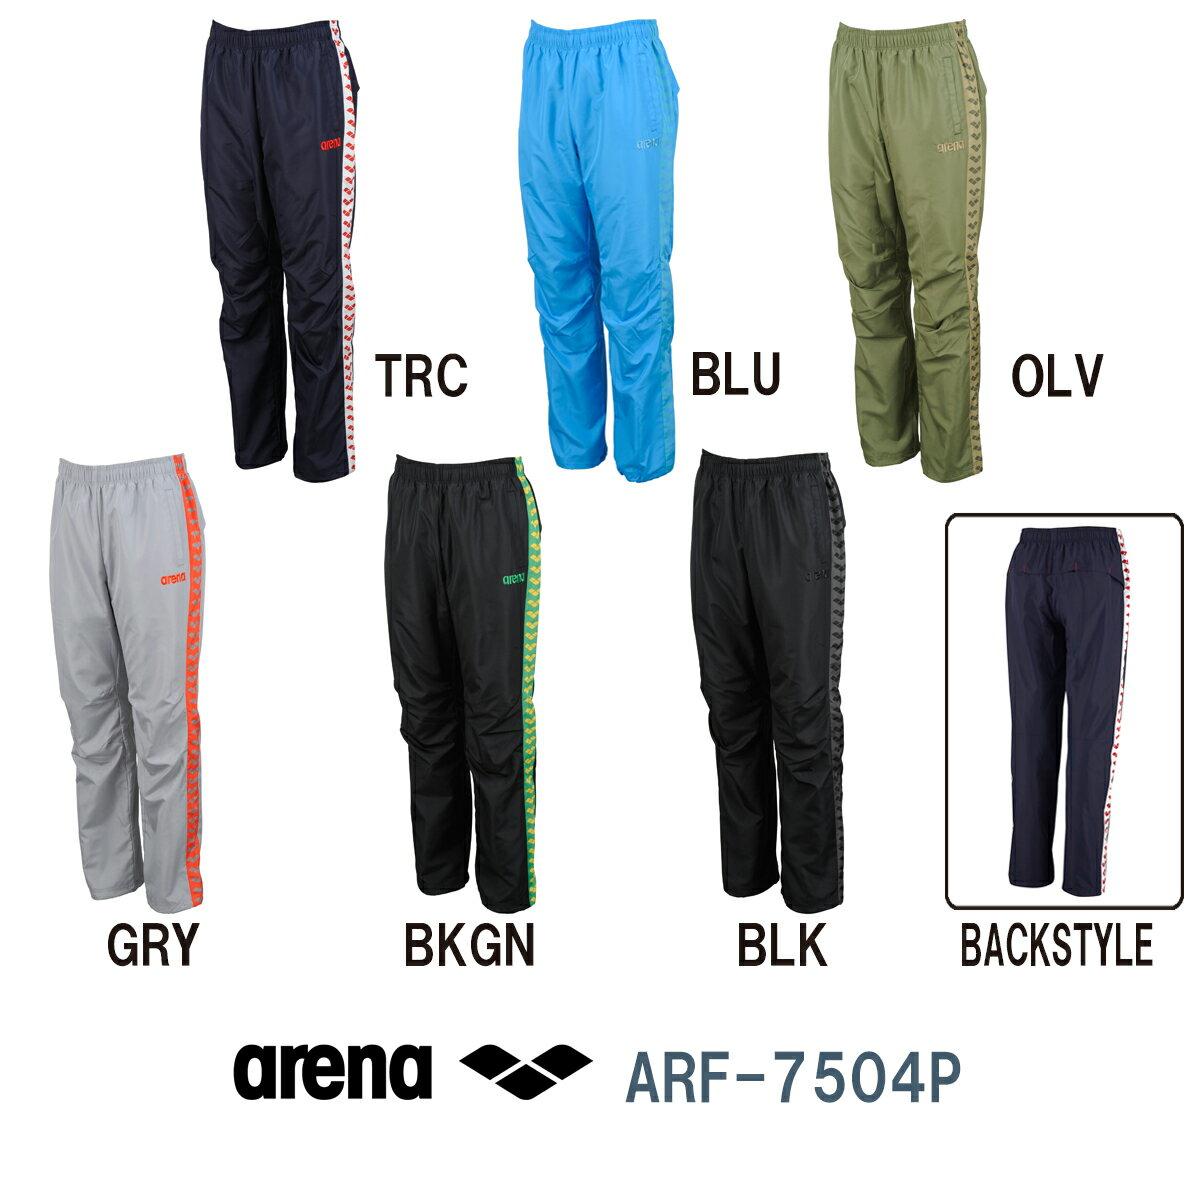 【ARF-7504P】ARENA(アリーナ) チームライン ウィンドロングパンツ[トレーニングウェア/アパレル]